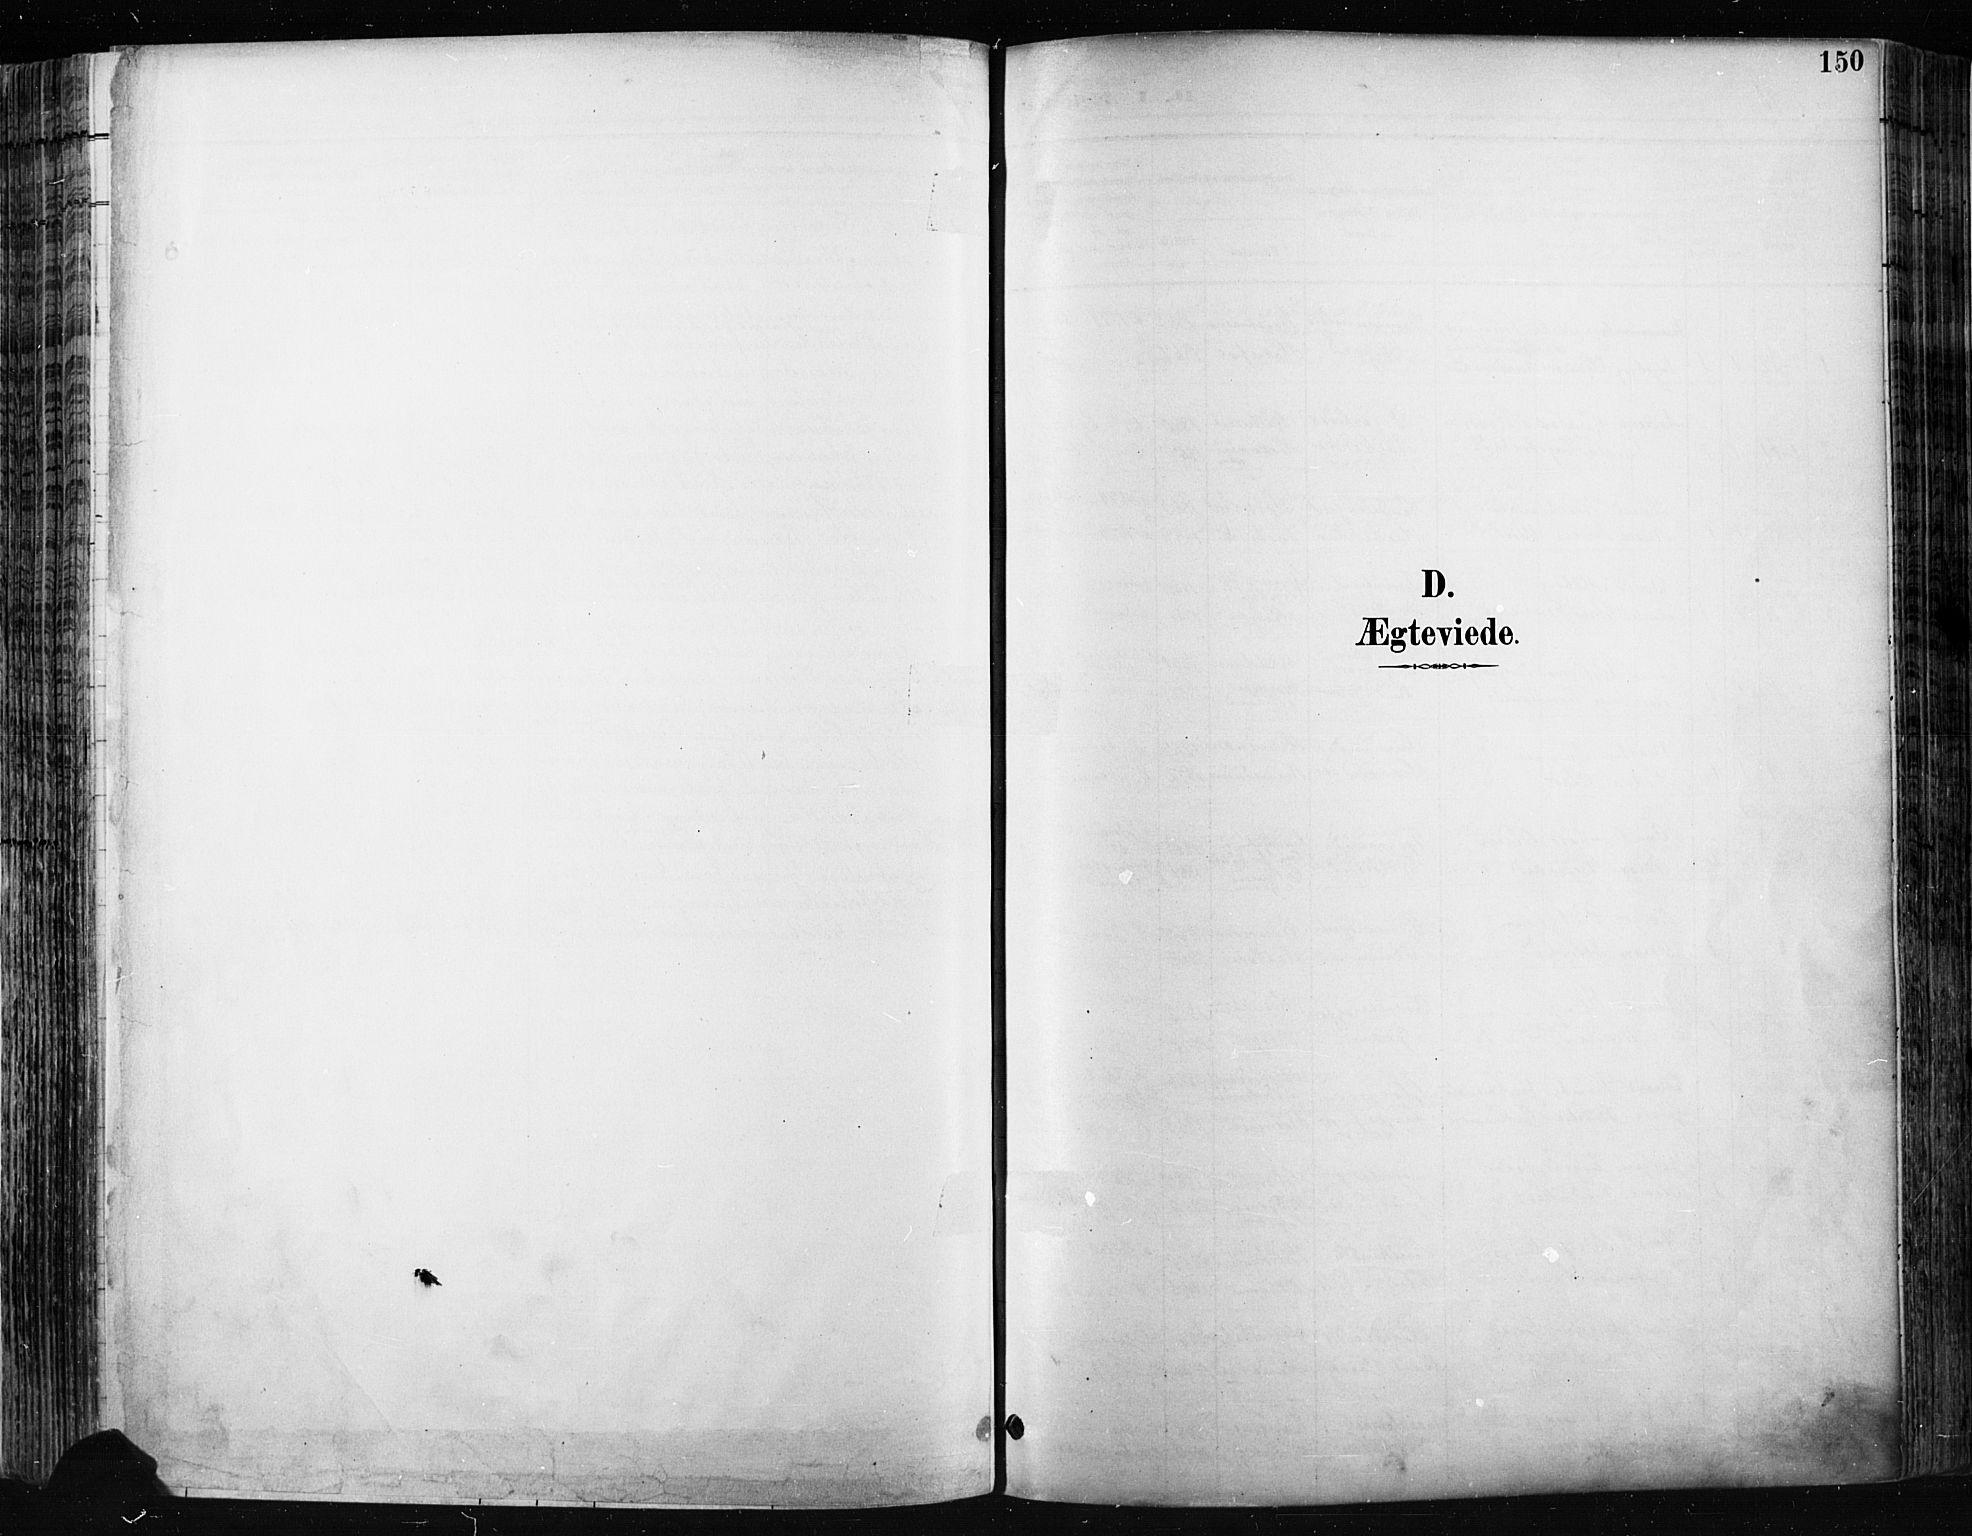 SAH, Jevnaker prestekontor, Ministerialbok nr. 9, 1891-1901, s. 150